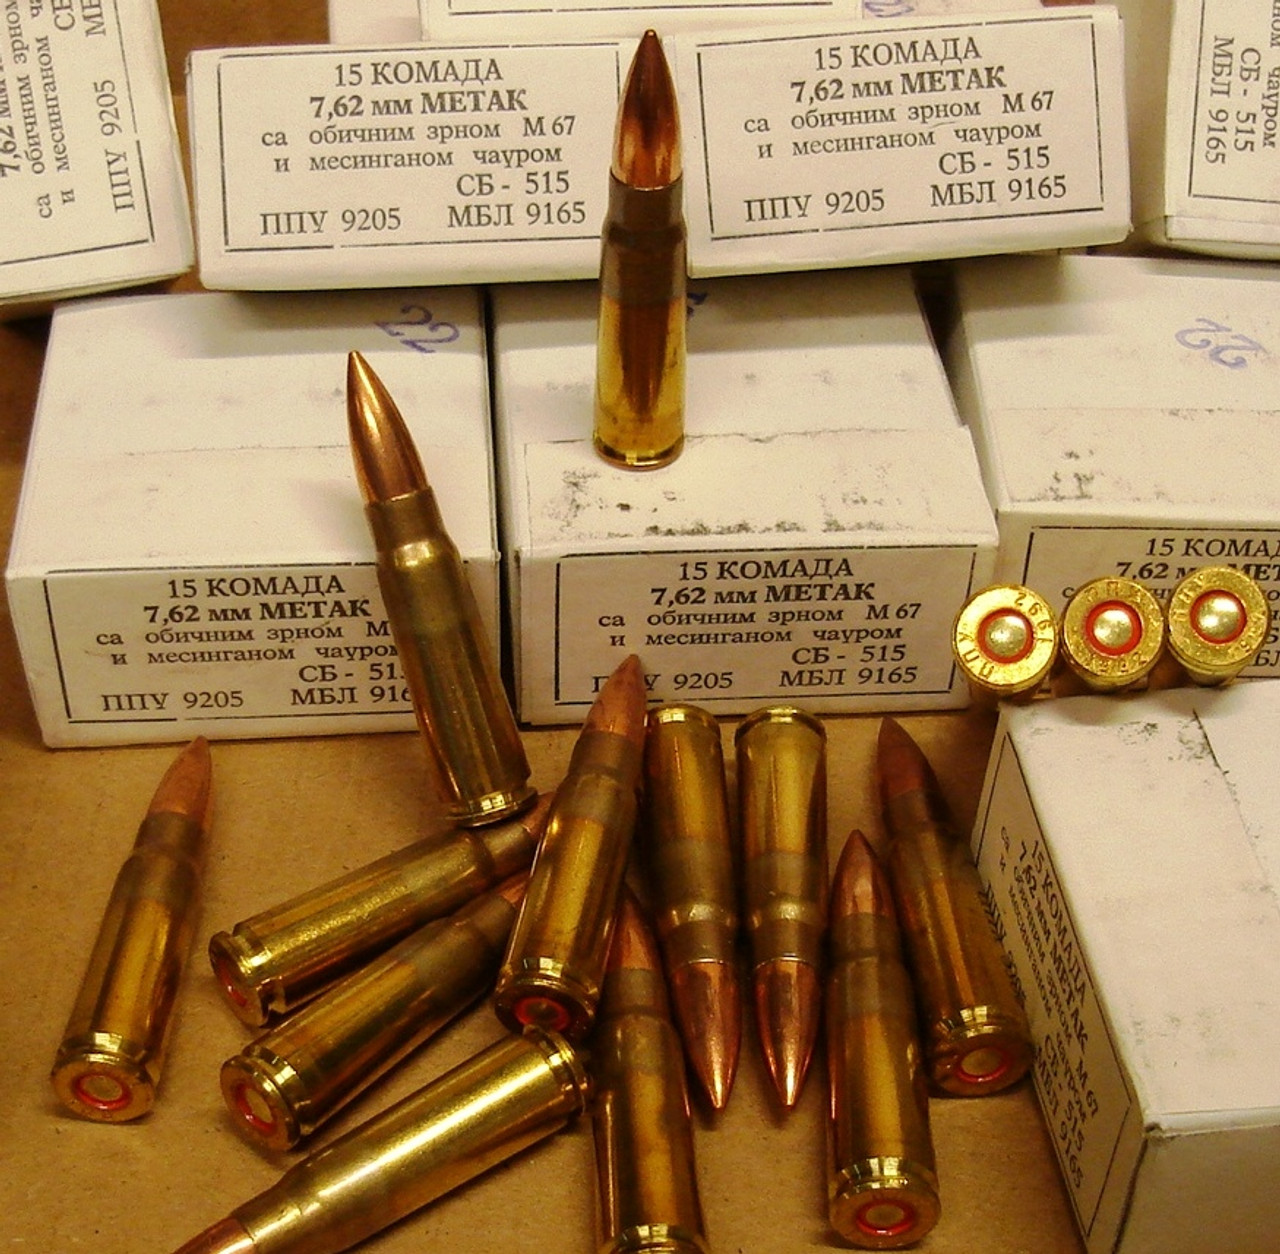 7.62x39 M67 Brass Cased Yugo/Privi Partizan '92 150rd Lots 123gr FMJ 15rd Bxs